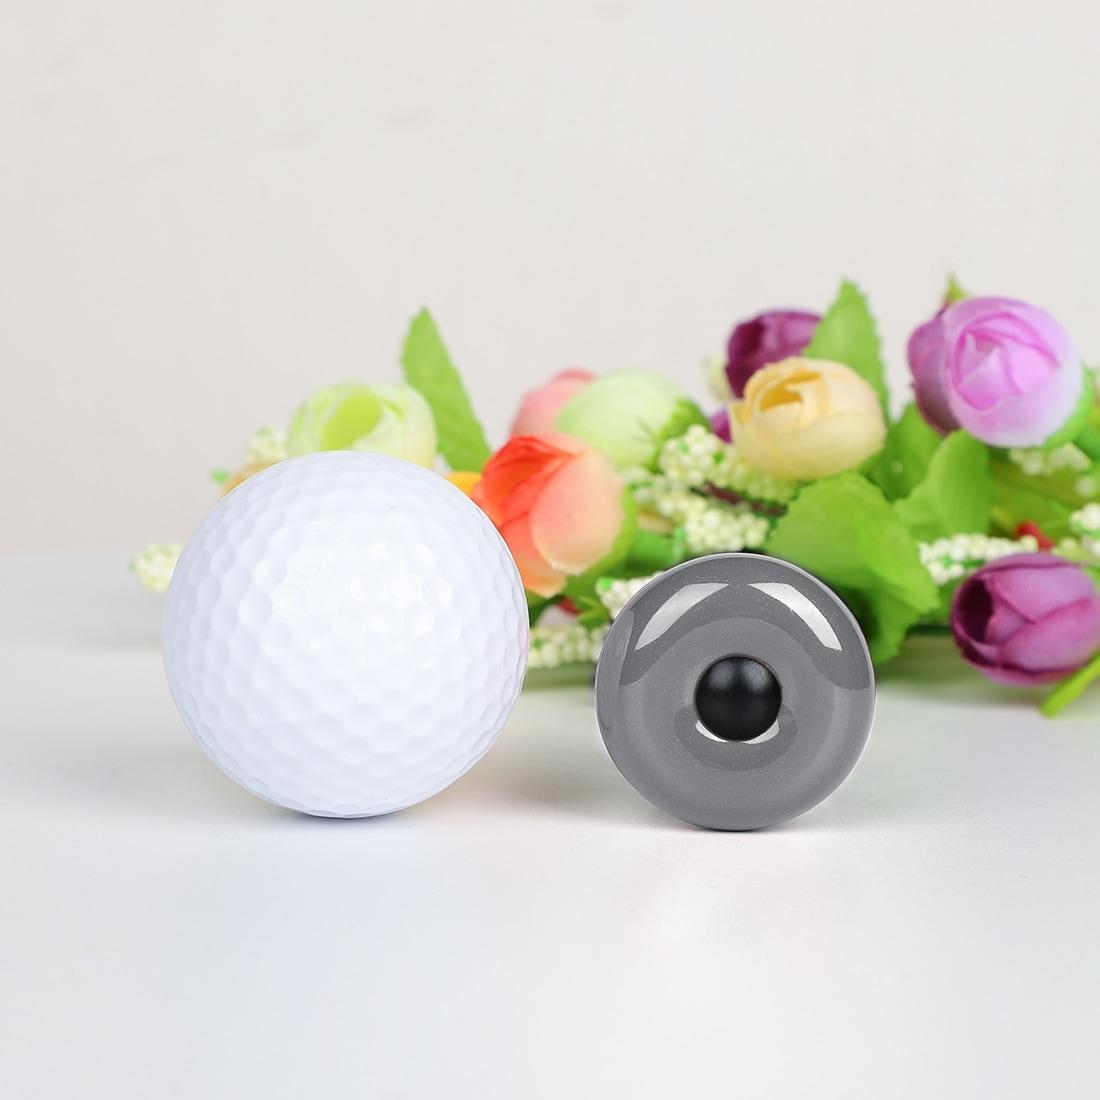 6x Dia 32mm White Ball Ceramic Handles And Knobs Cabinet Dresser Drawer Pulls